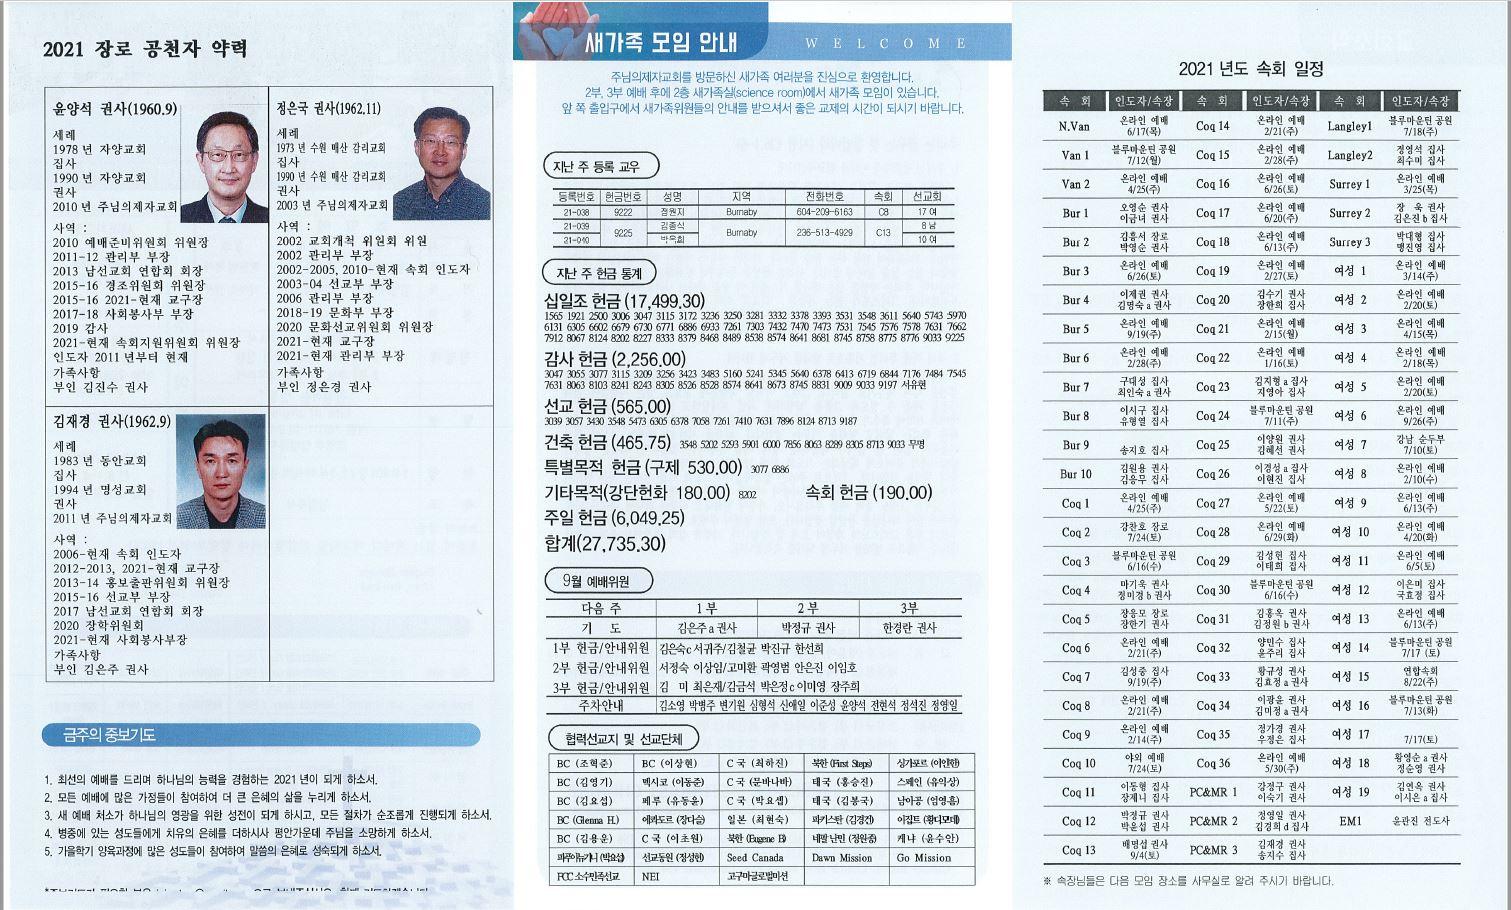 mb-file.php?path=2021%2F09%2F03%2FF2772_Capture-1.JPG